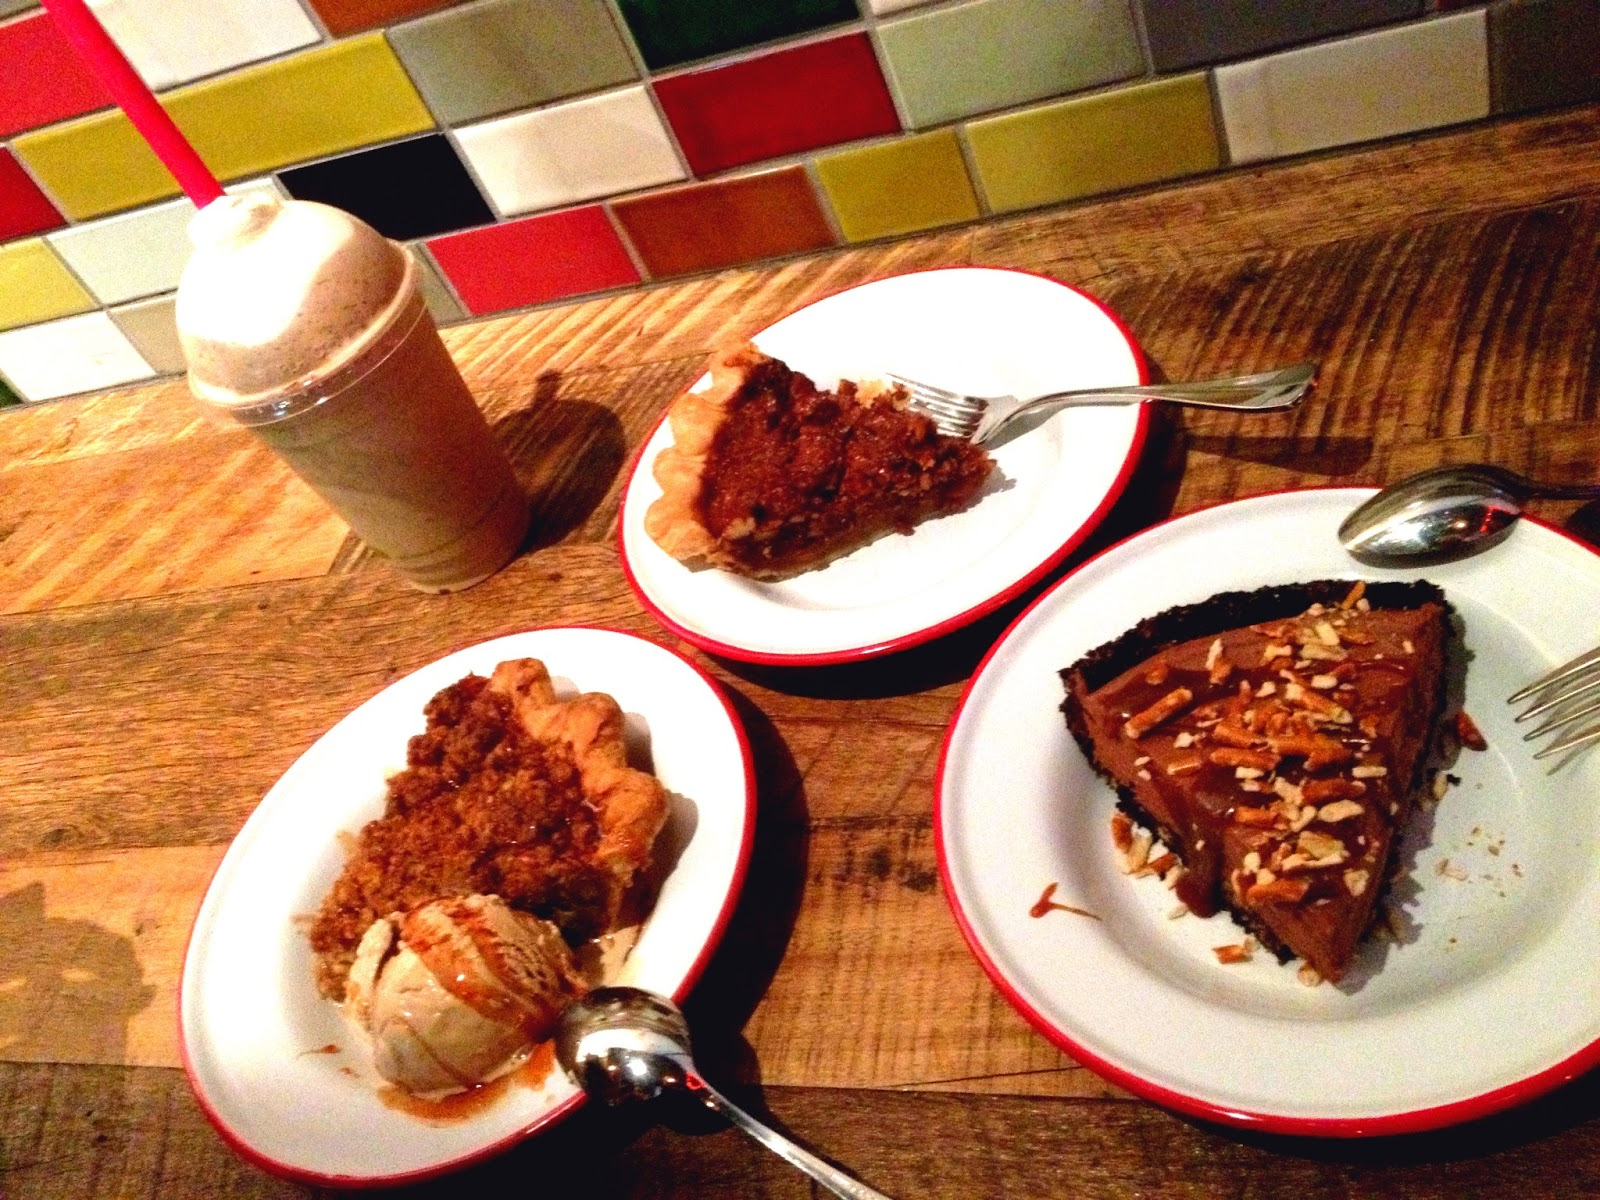 The pie shake & 3 pie slices